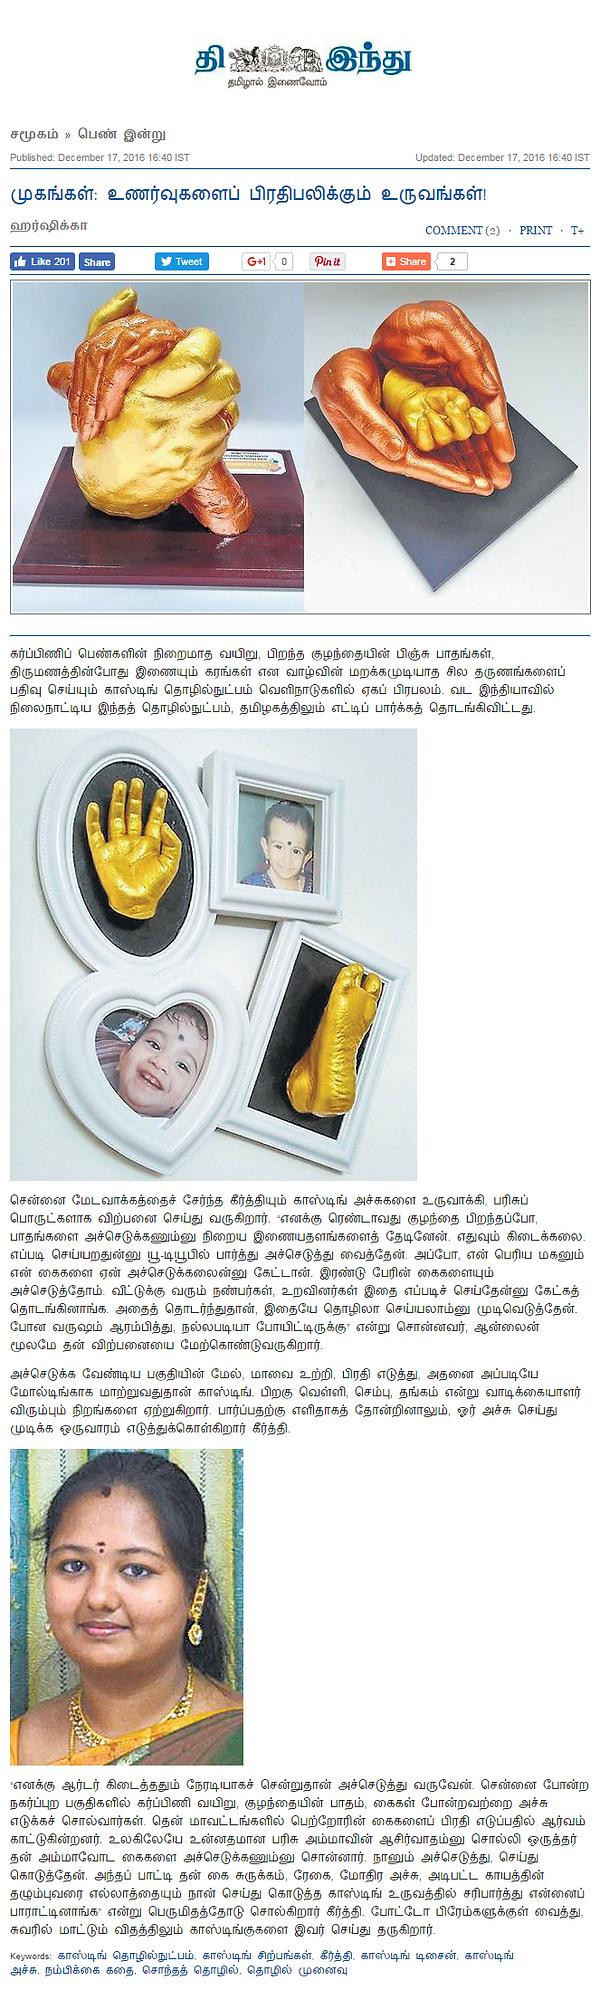 Lifeimpressions baby hand casting chennai